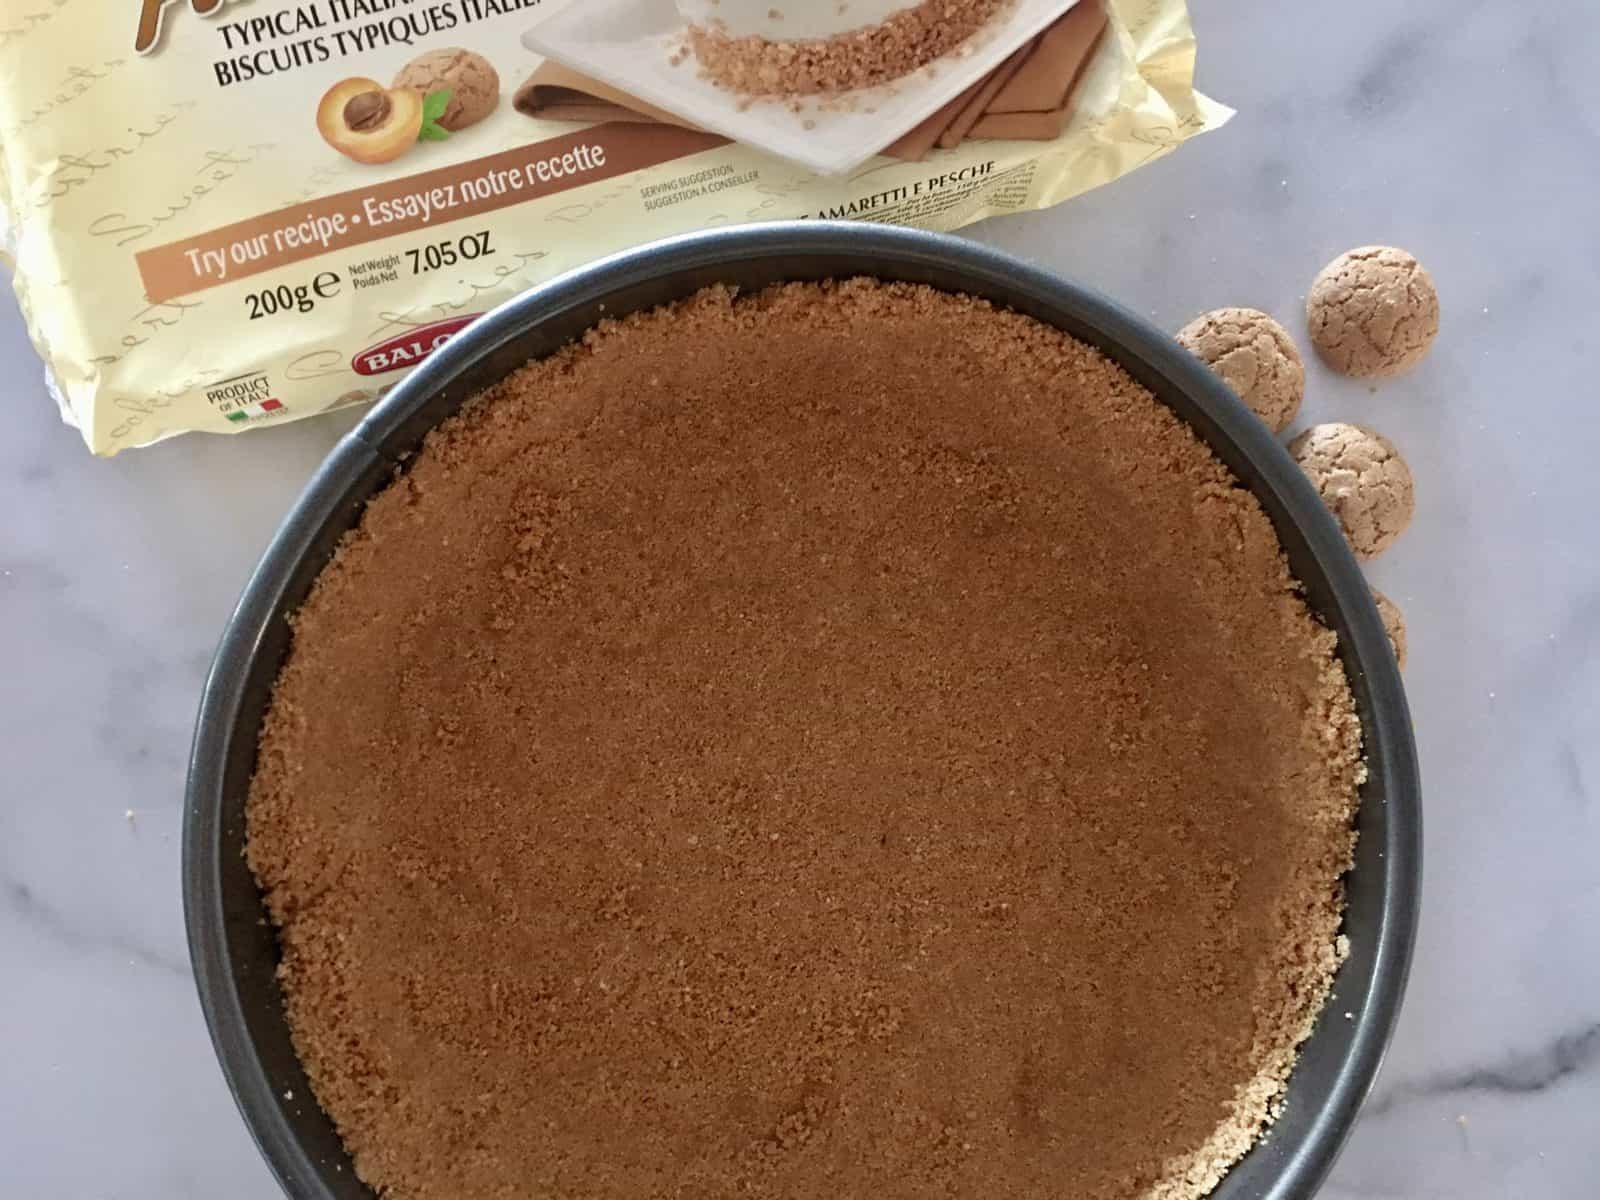 Amaretti cookie cheesecake crust in a springform pan.